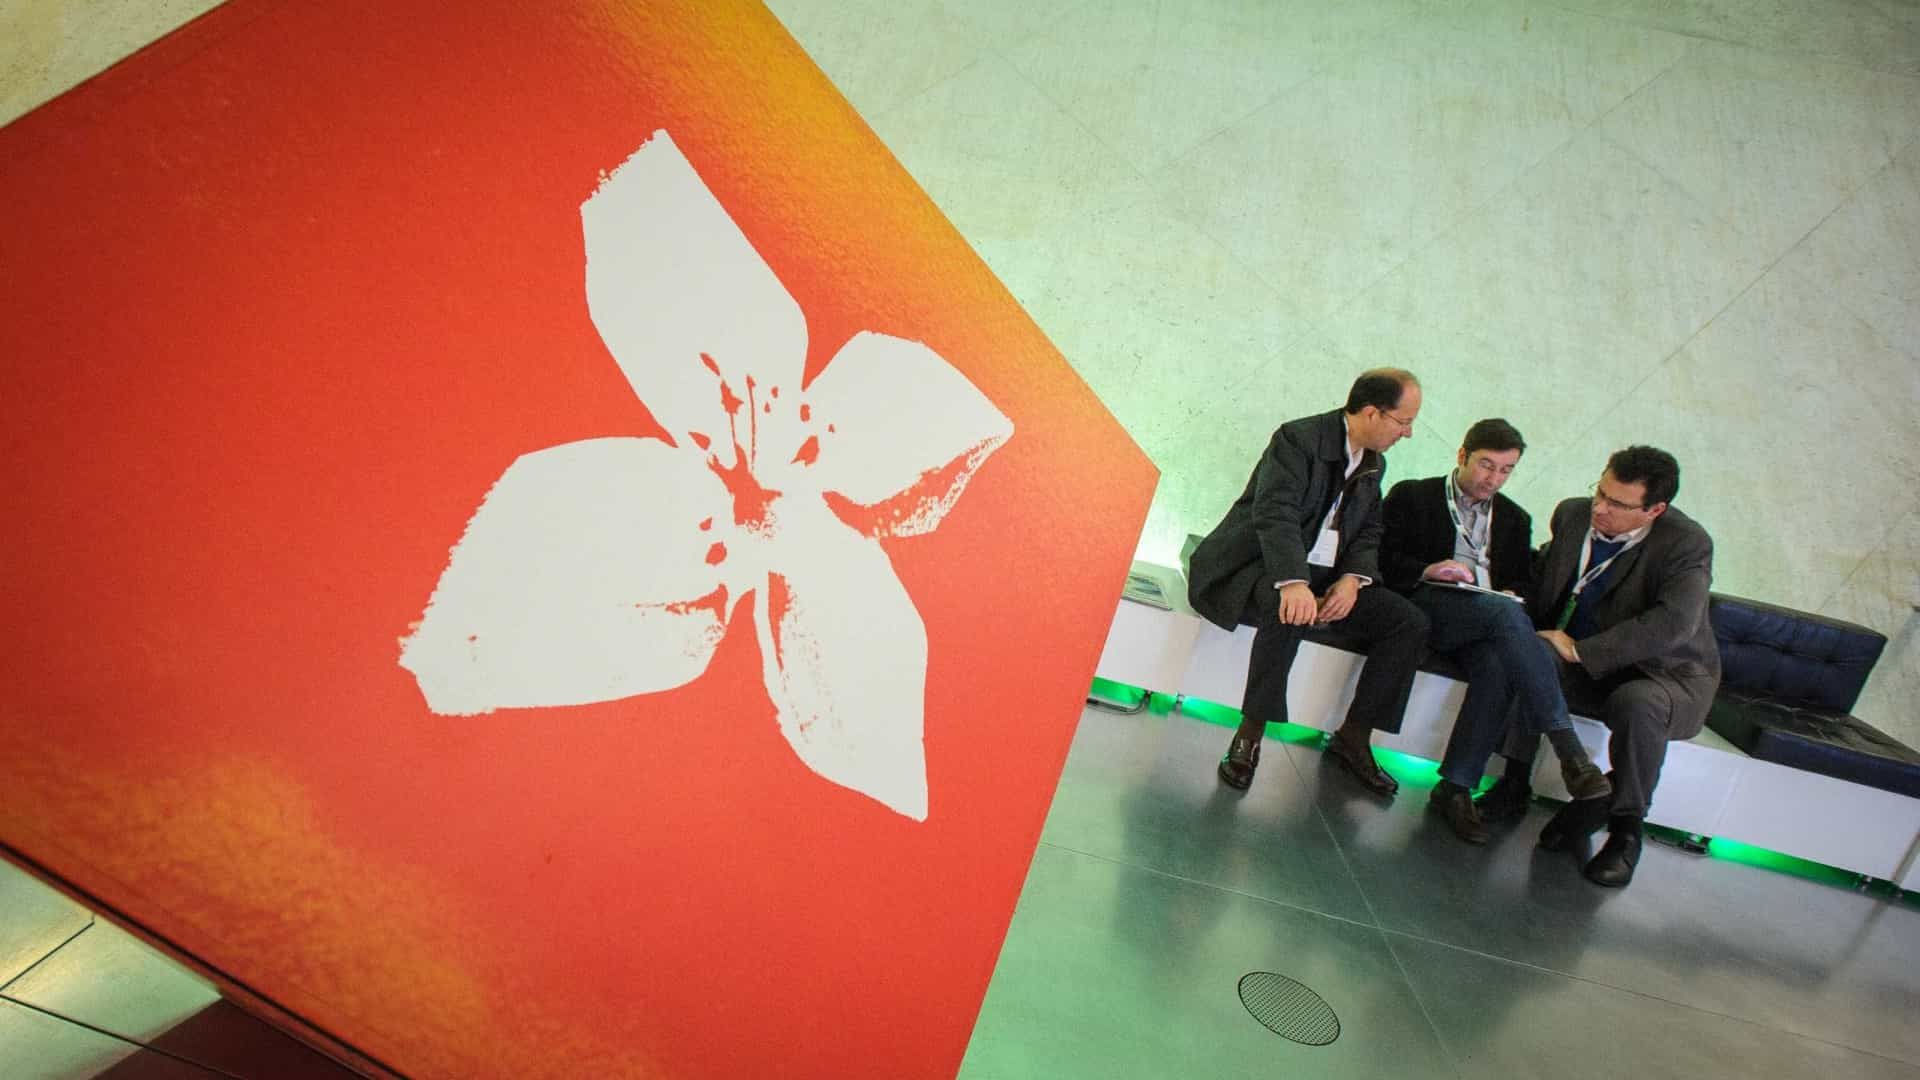 Agência Standard & Poor's sobe 'rating' do banco BPI